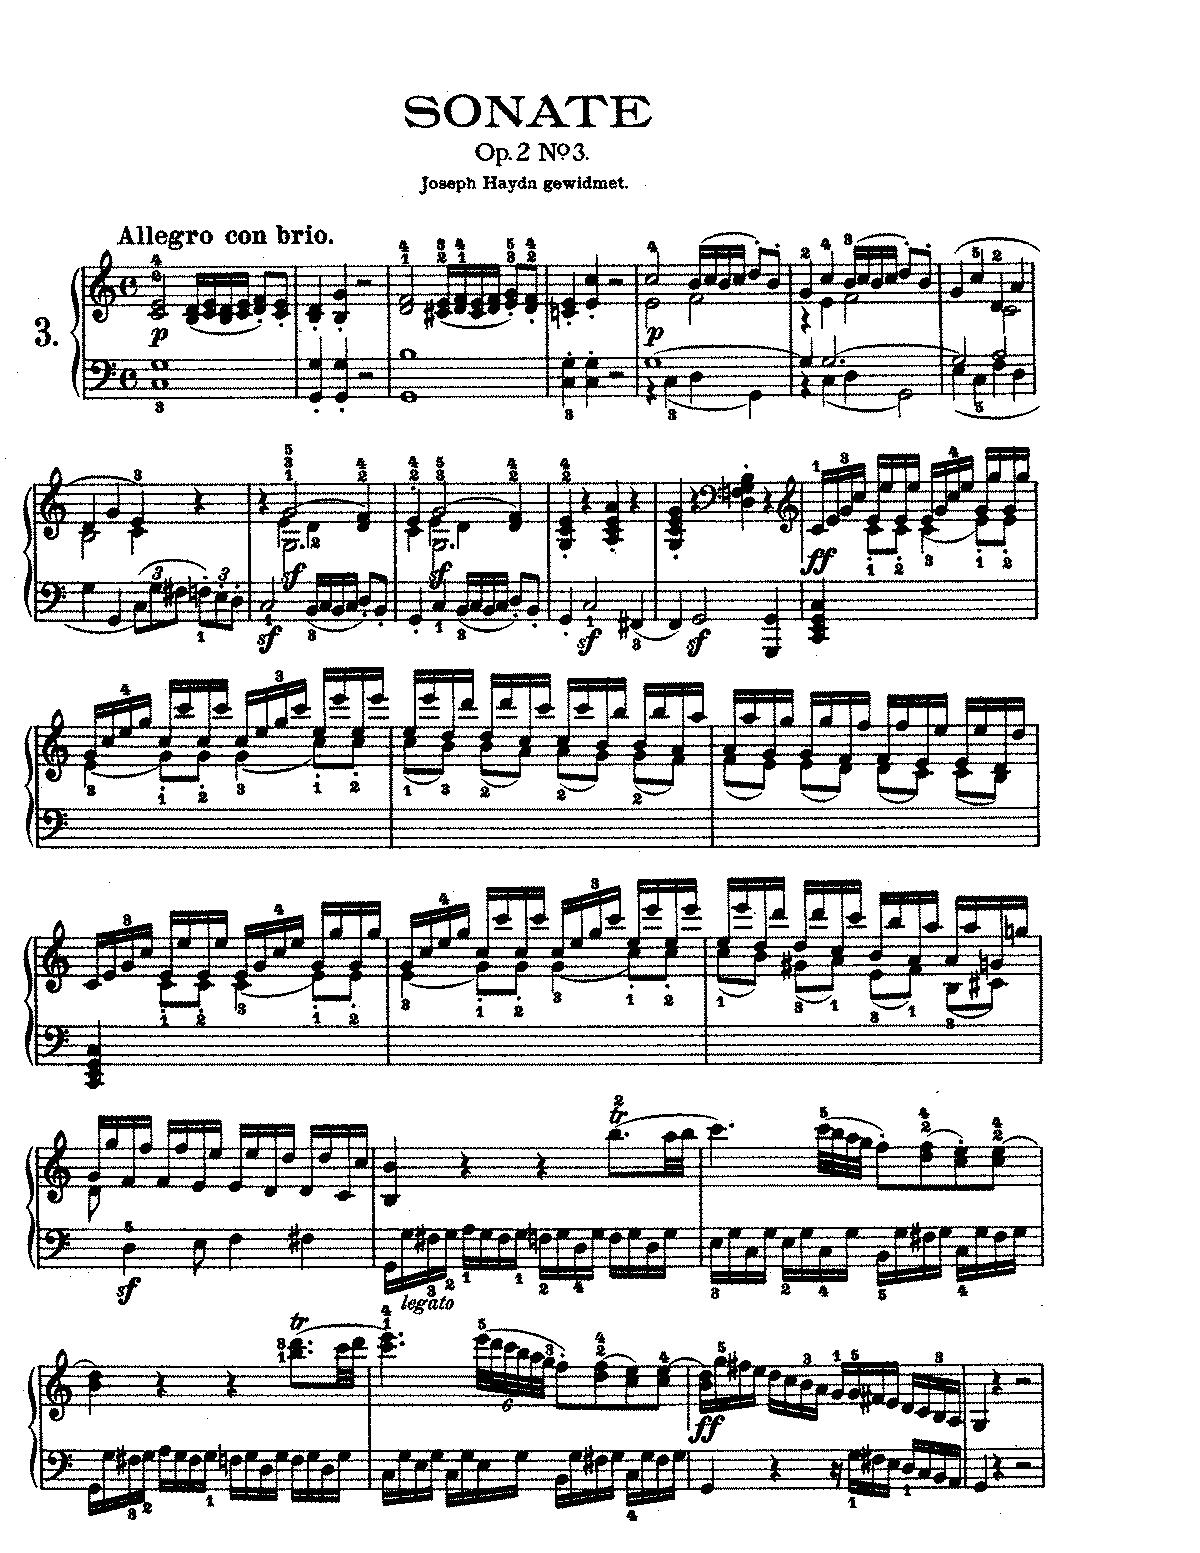 Piano Sonata No. 7, Op. 10 no. 3 (Beethovens Werke, Serie XVI)